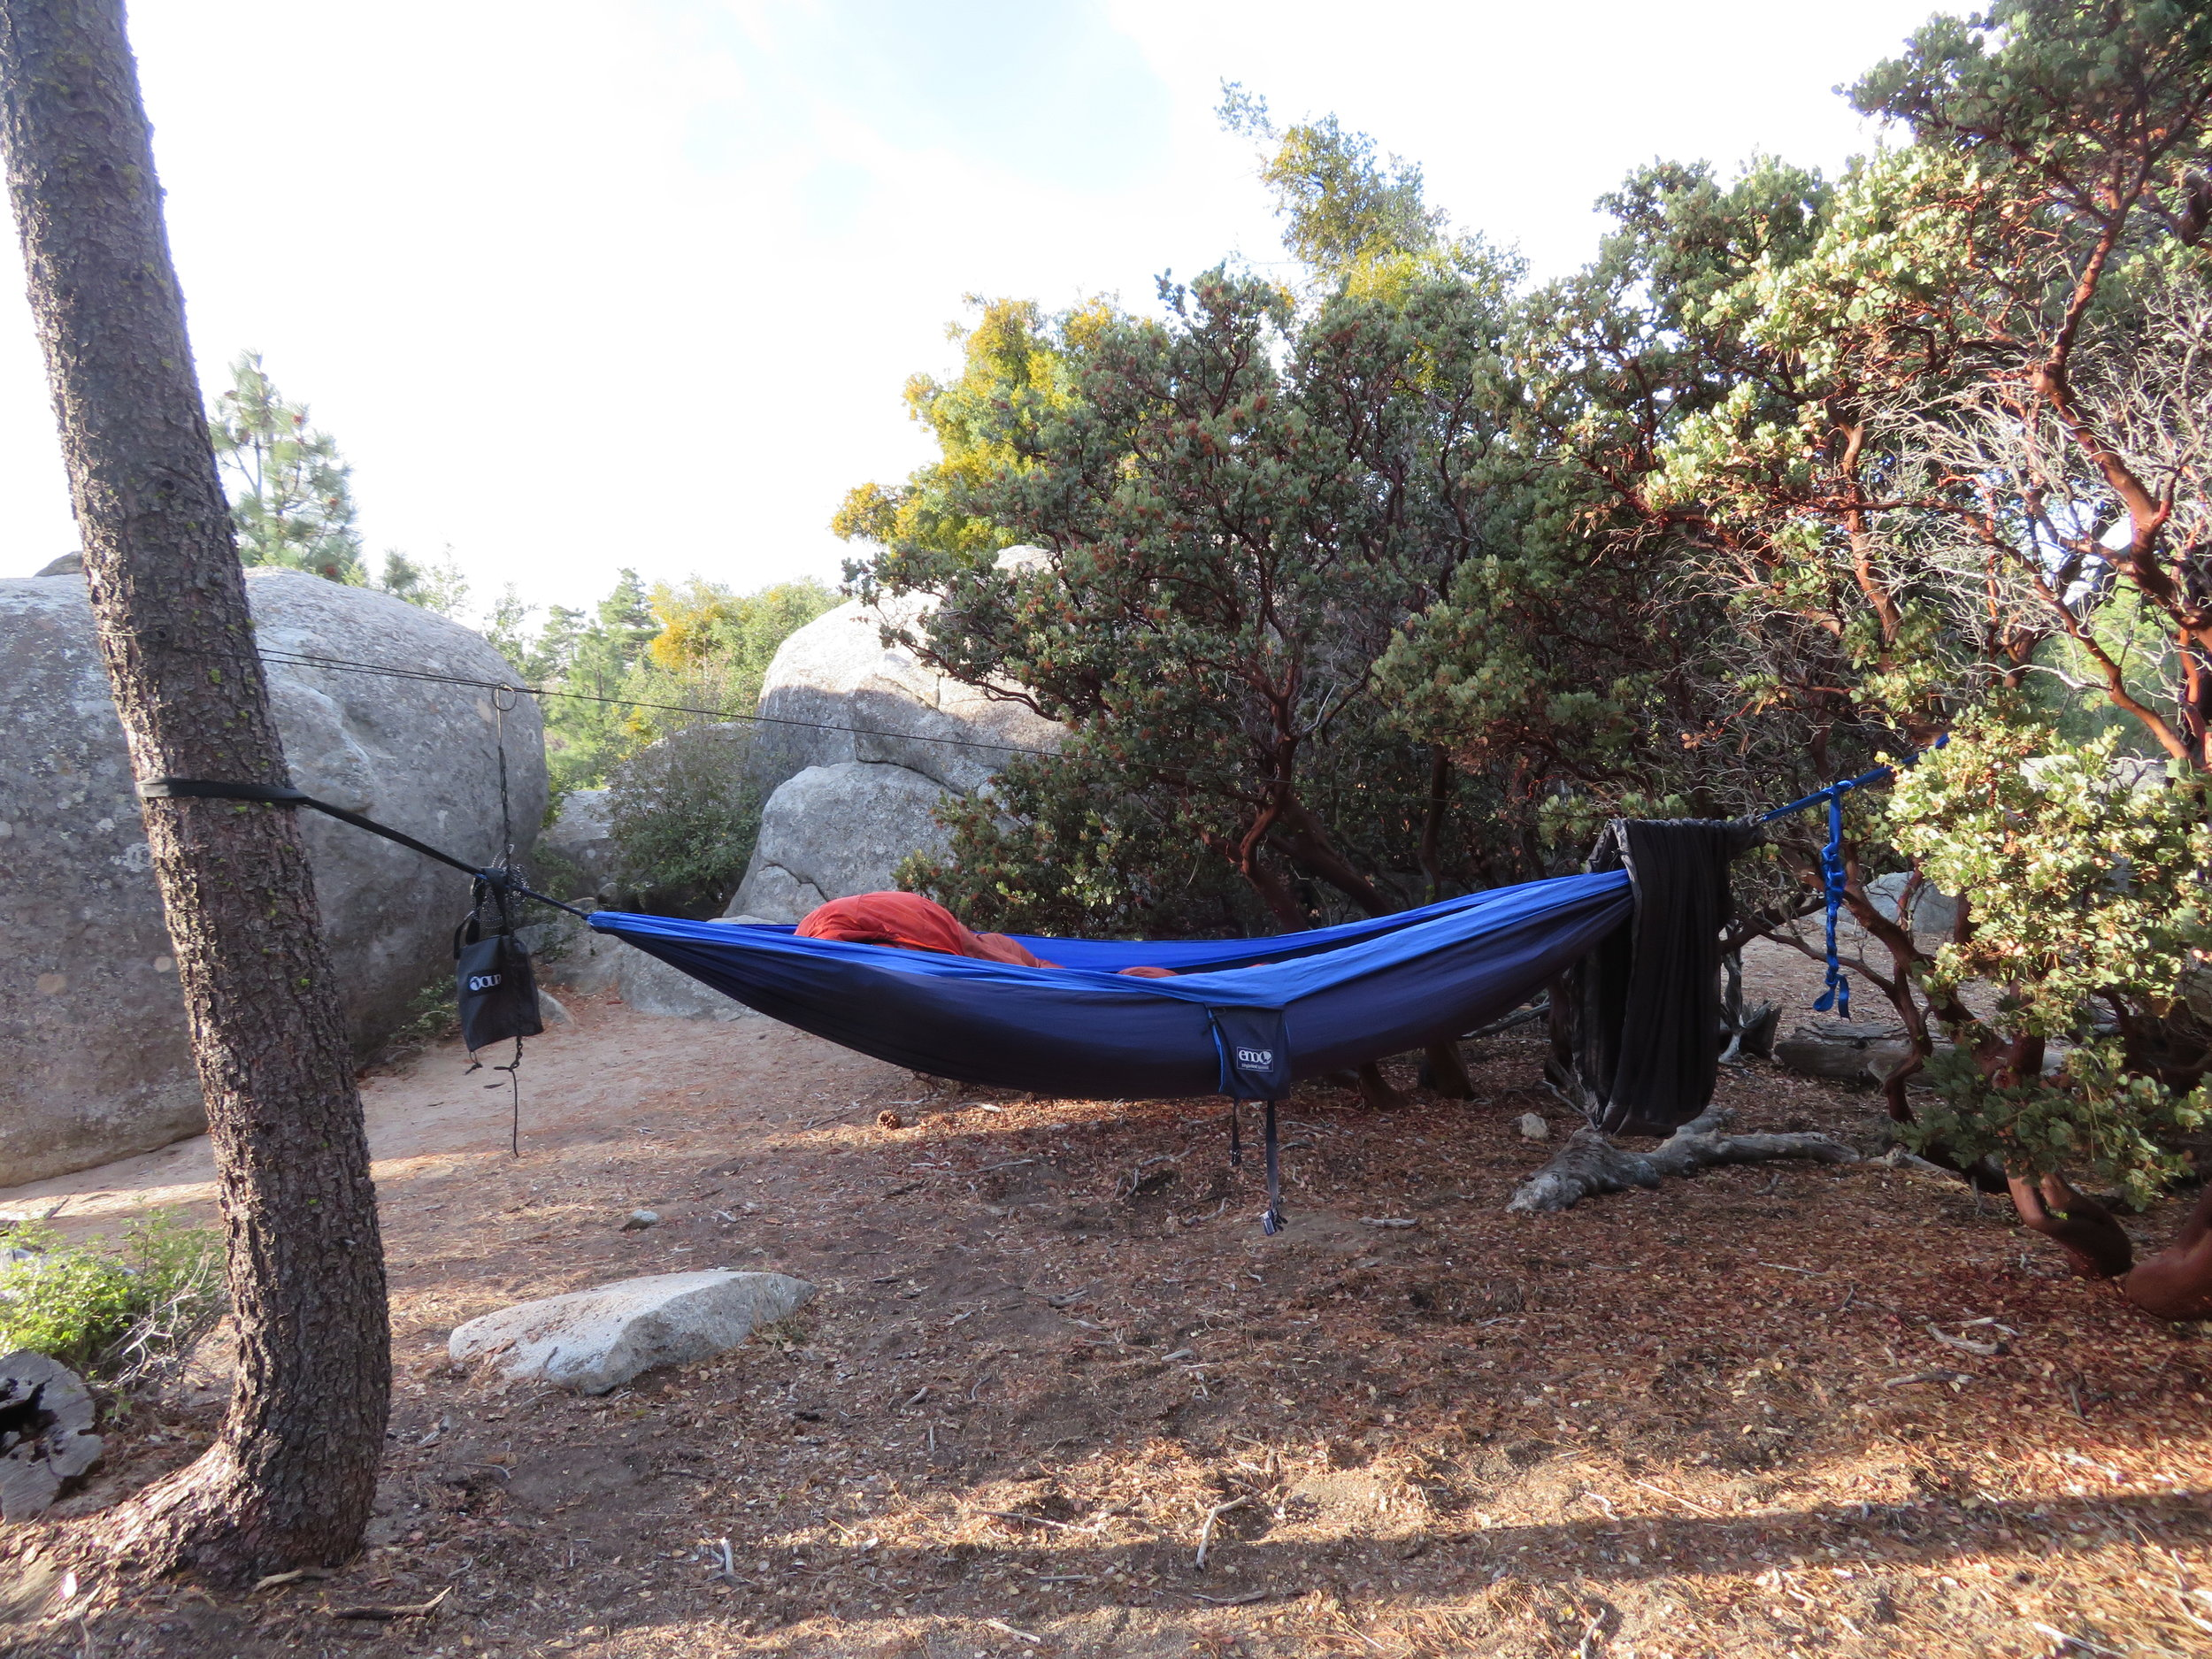 Land Chad Eric camping Legacy cache idyllwild CAIMG_0047.JPG